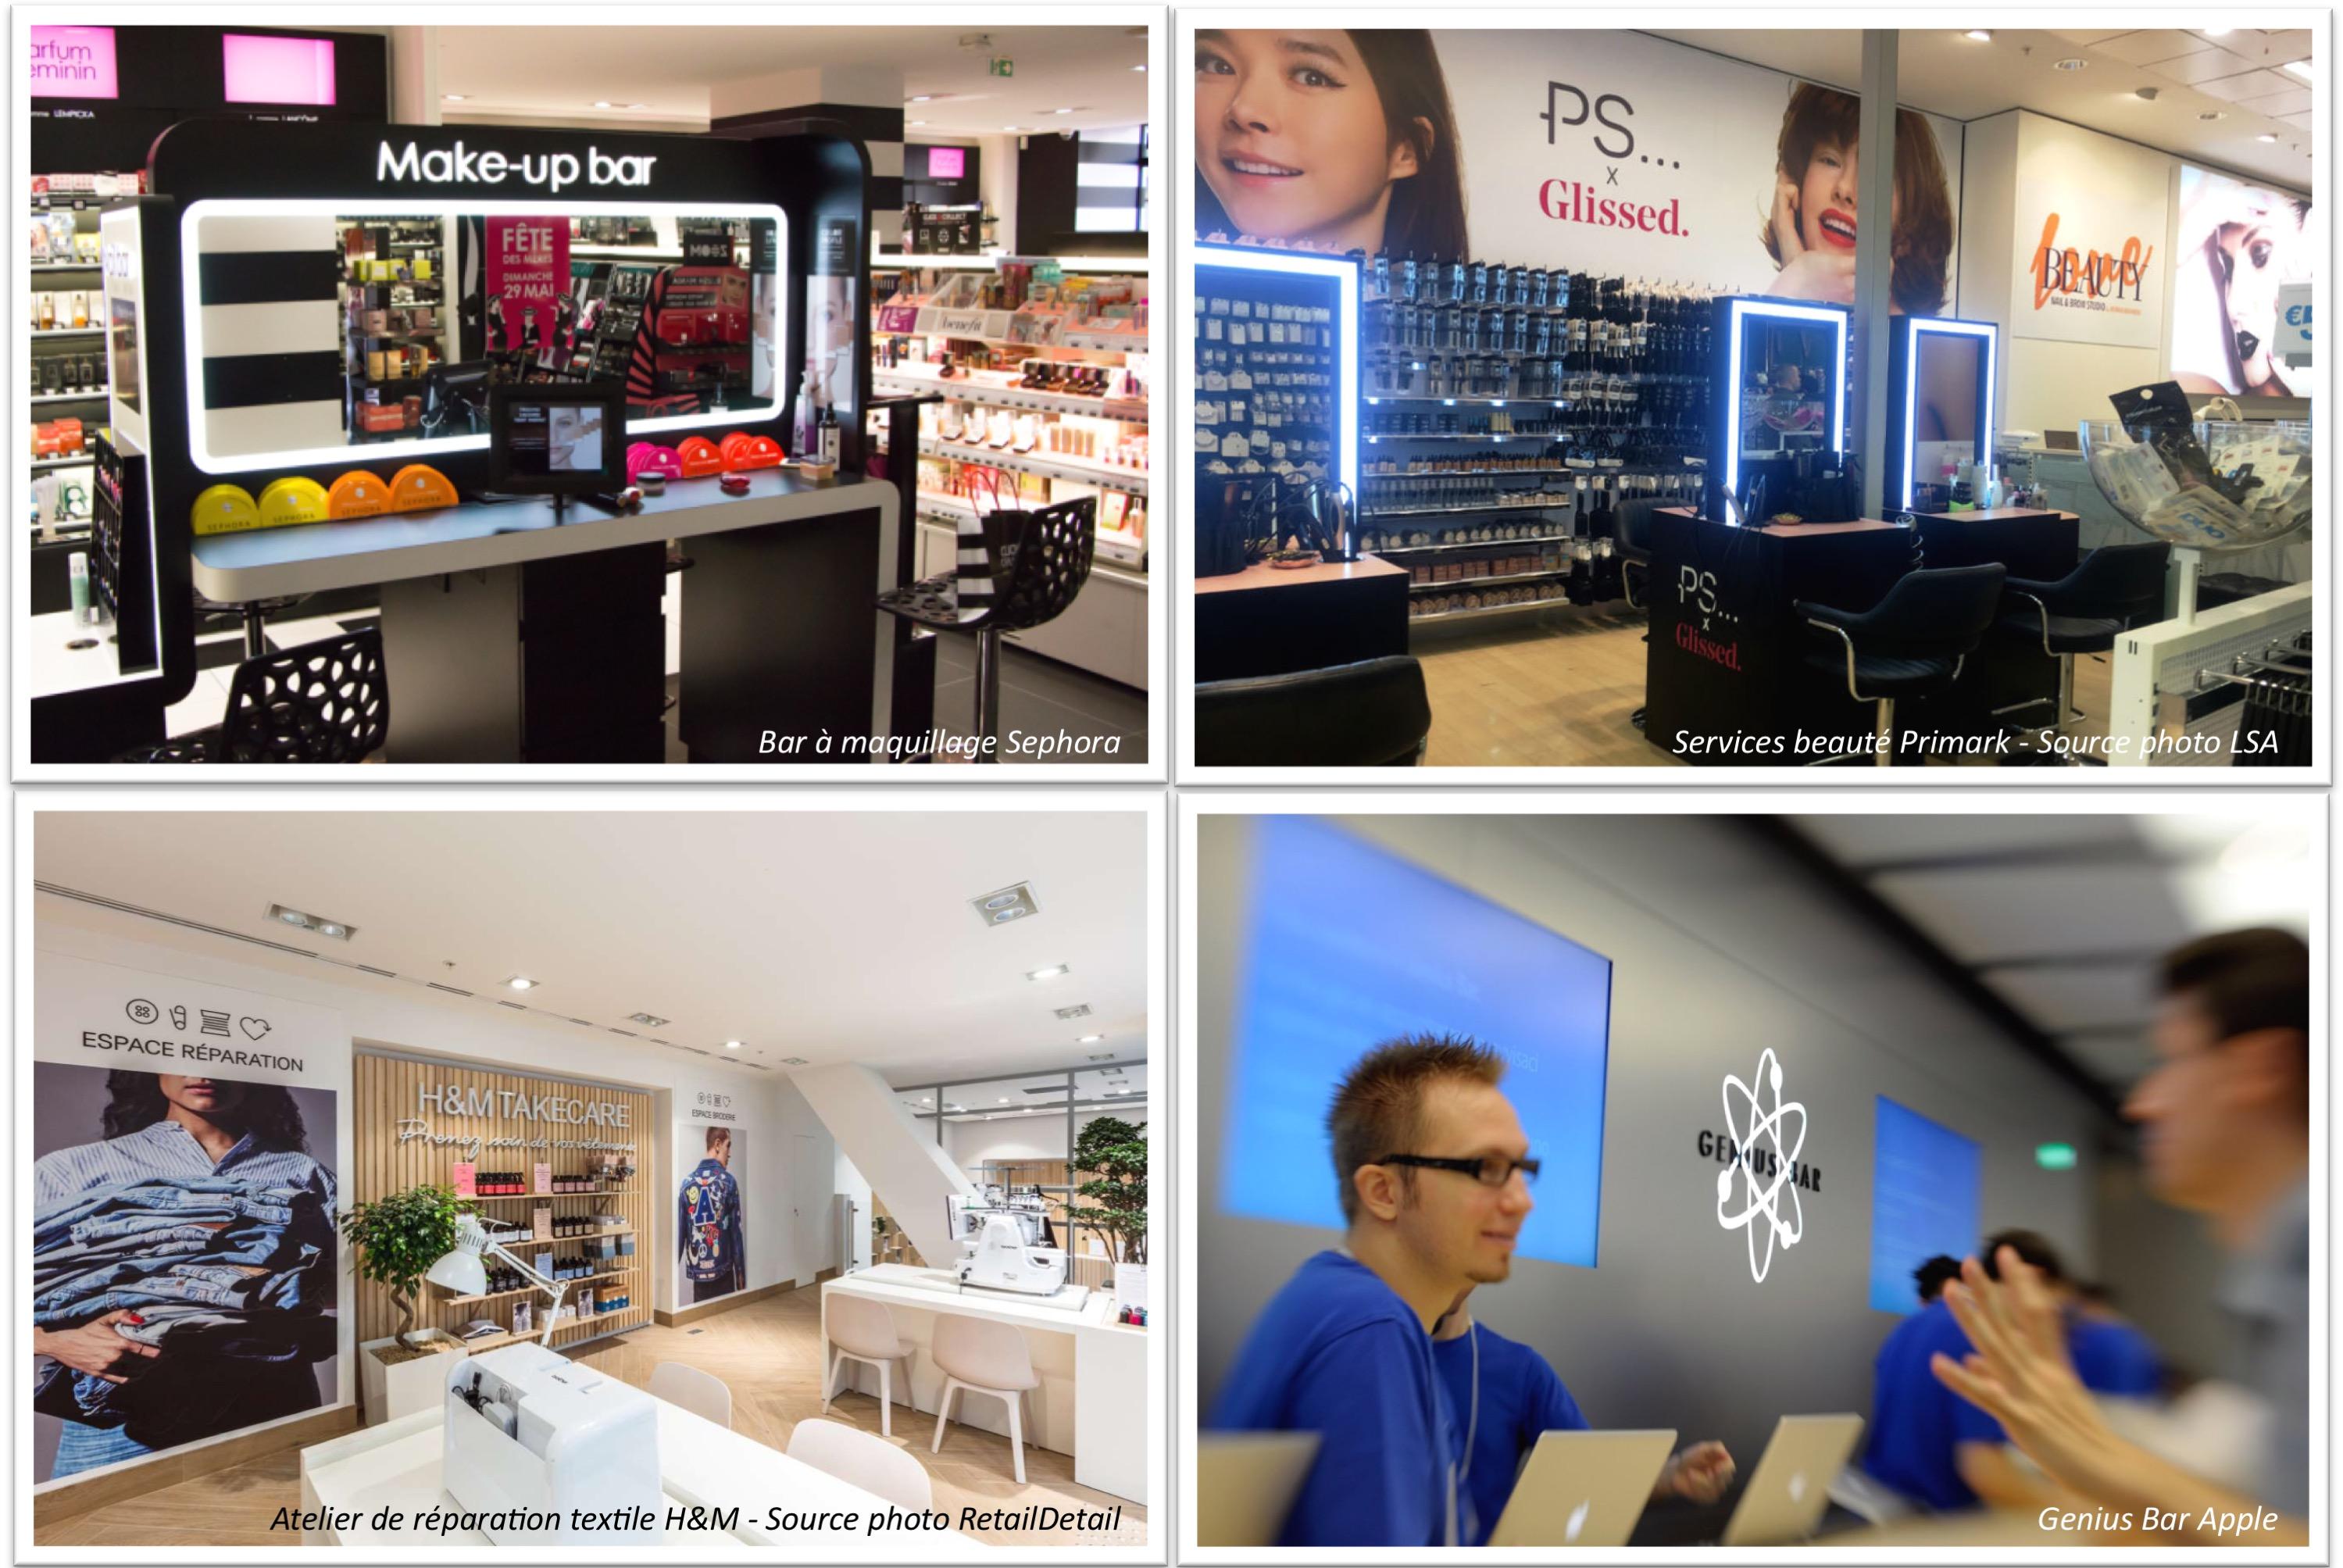 Services dédiés Apple - Sephora - Primark - H&M